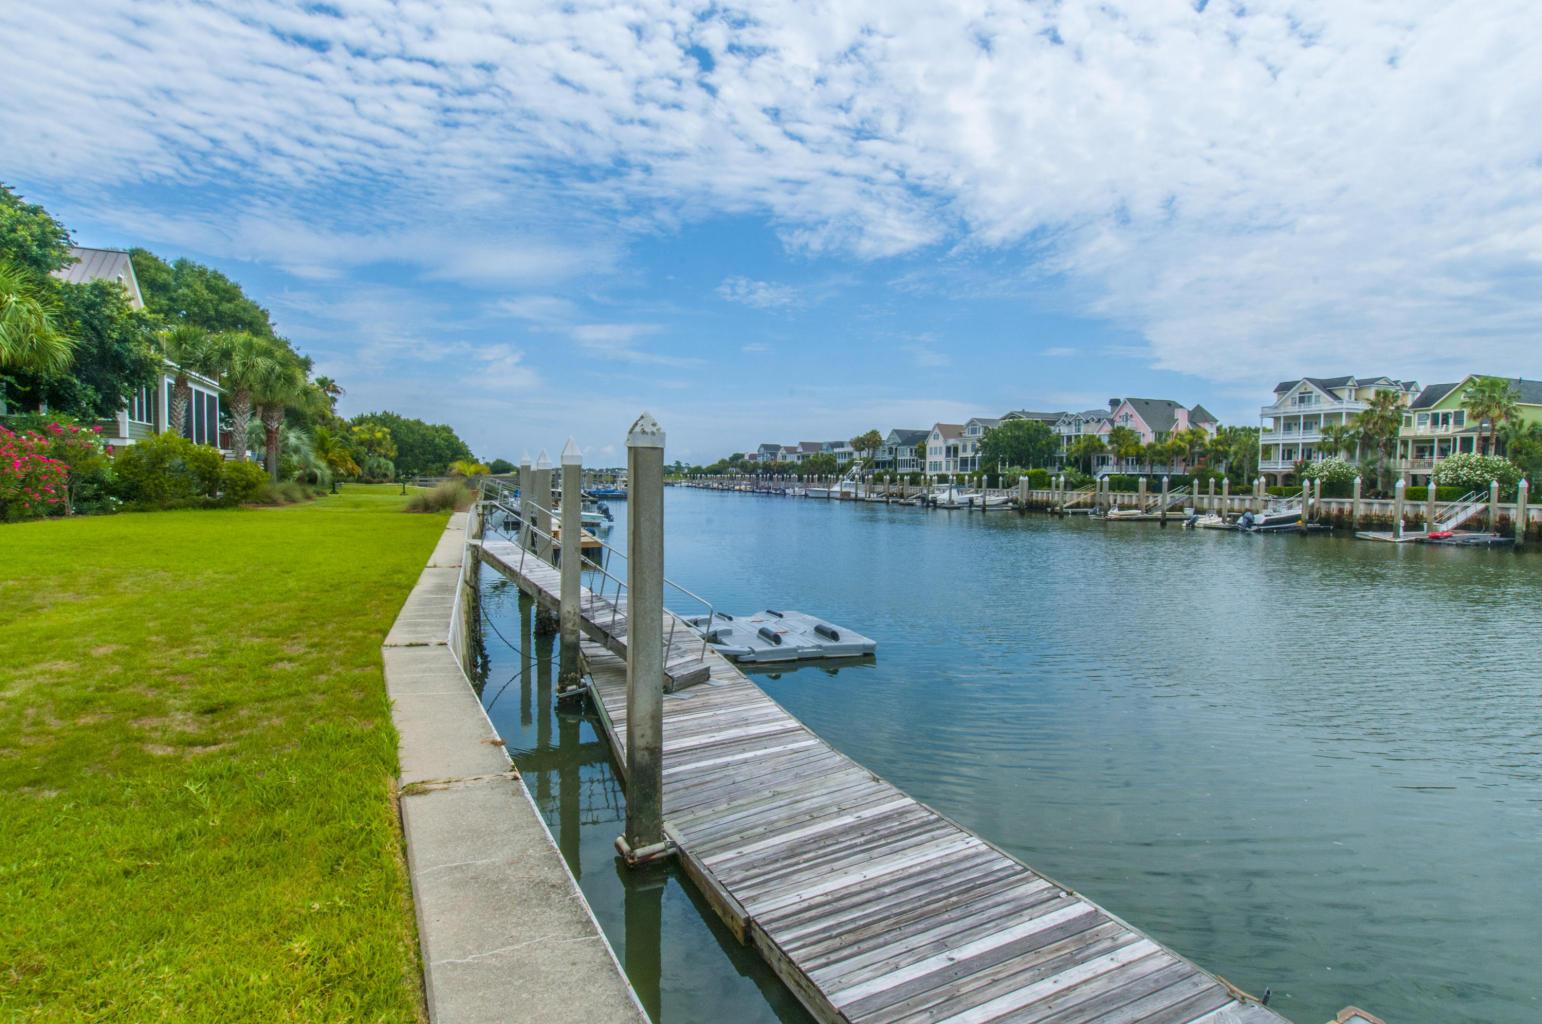 Photo of 50 Waterway Island Dr, Isle of Palms, SC 29451